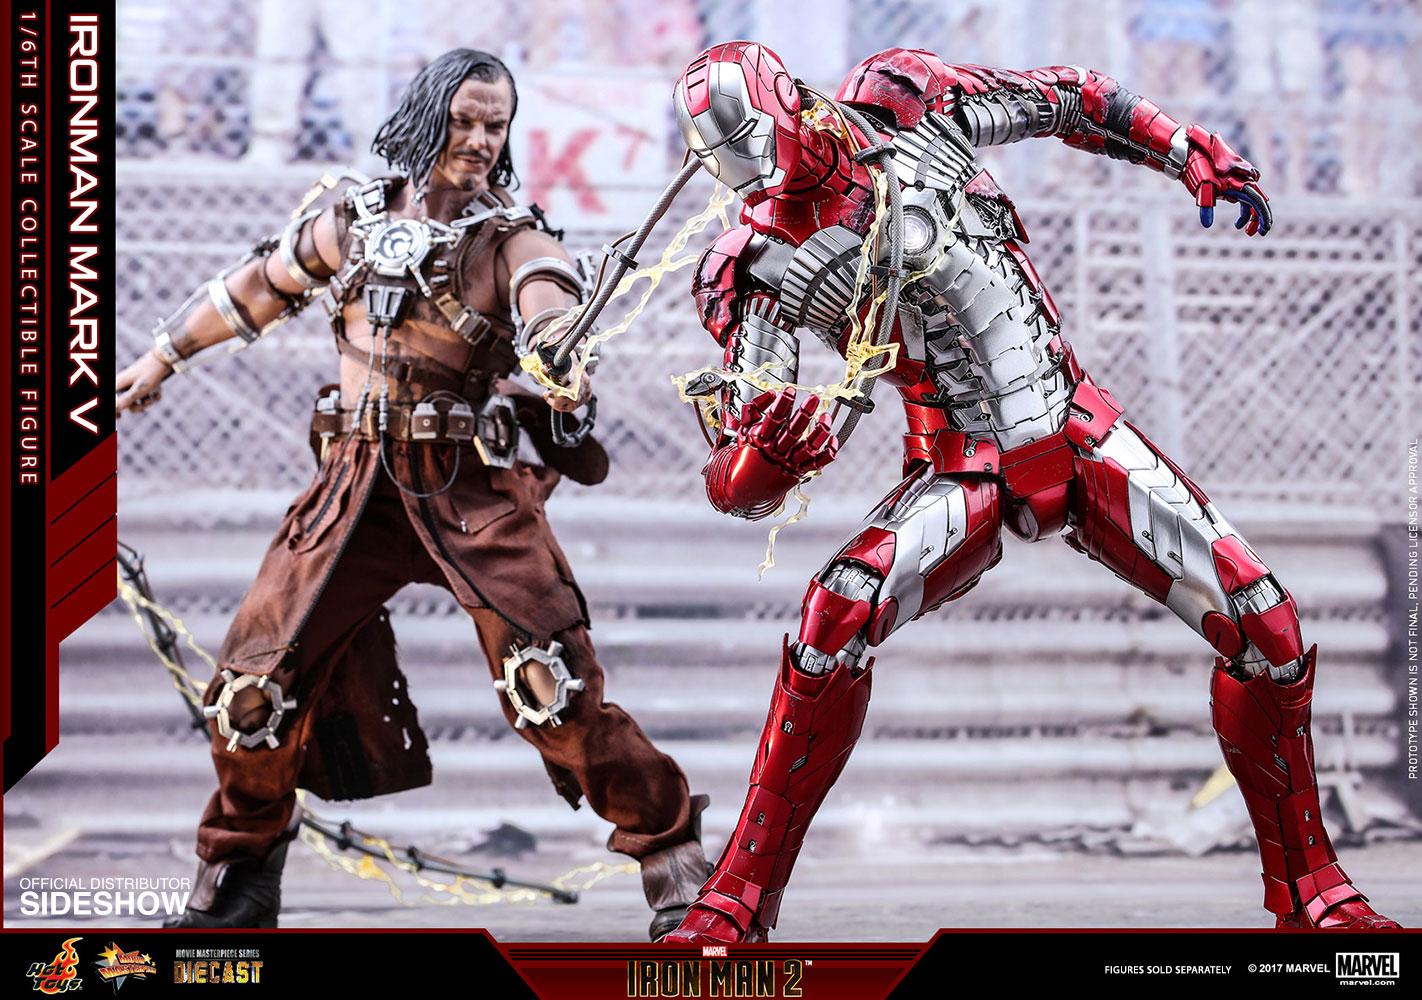 Marvel Iron Man Mark V Sixth Scale Figure By Hot Toys Sideshow